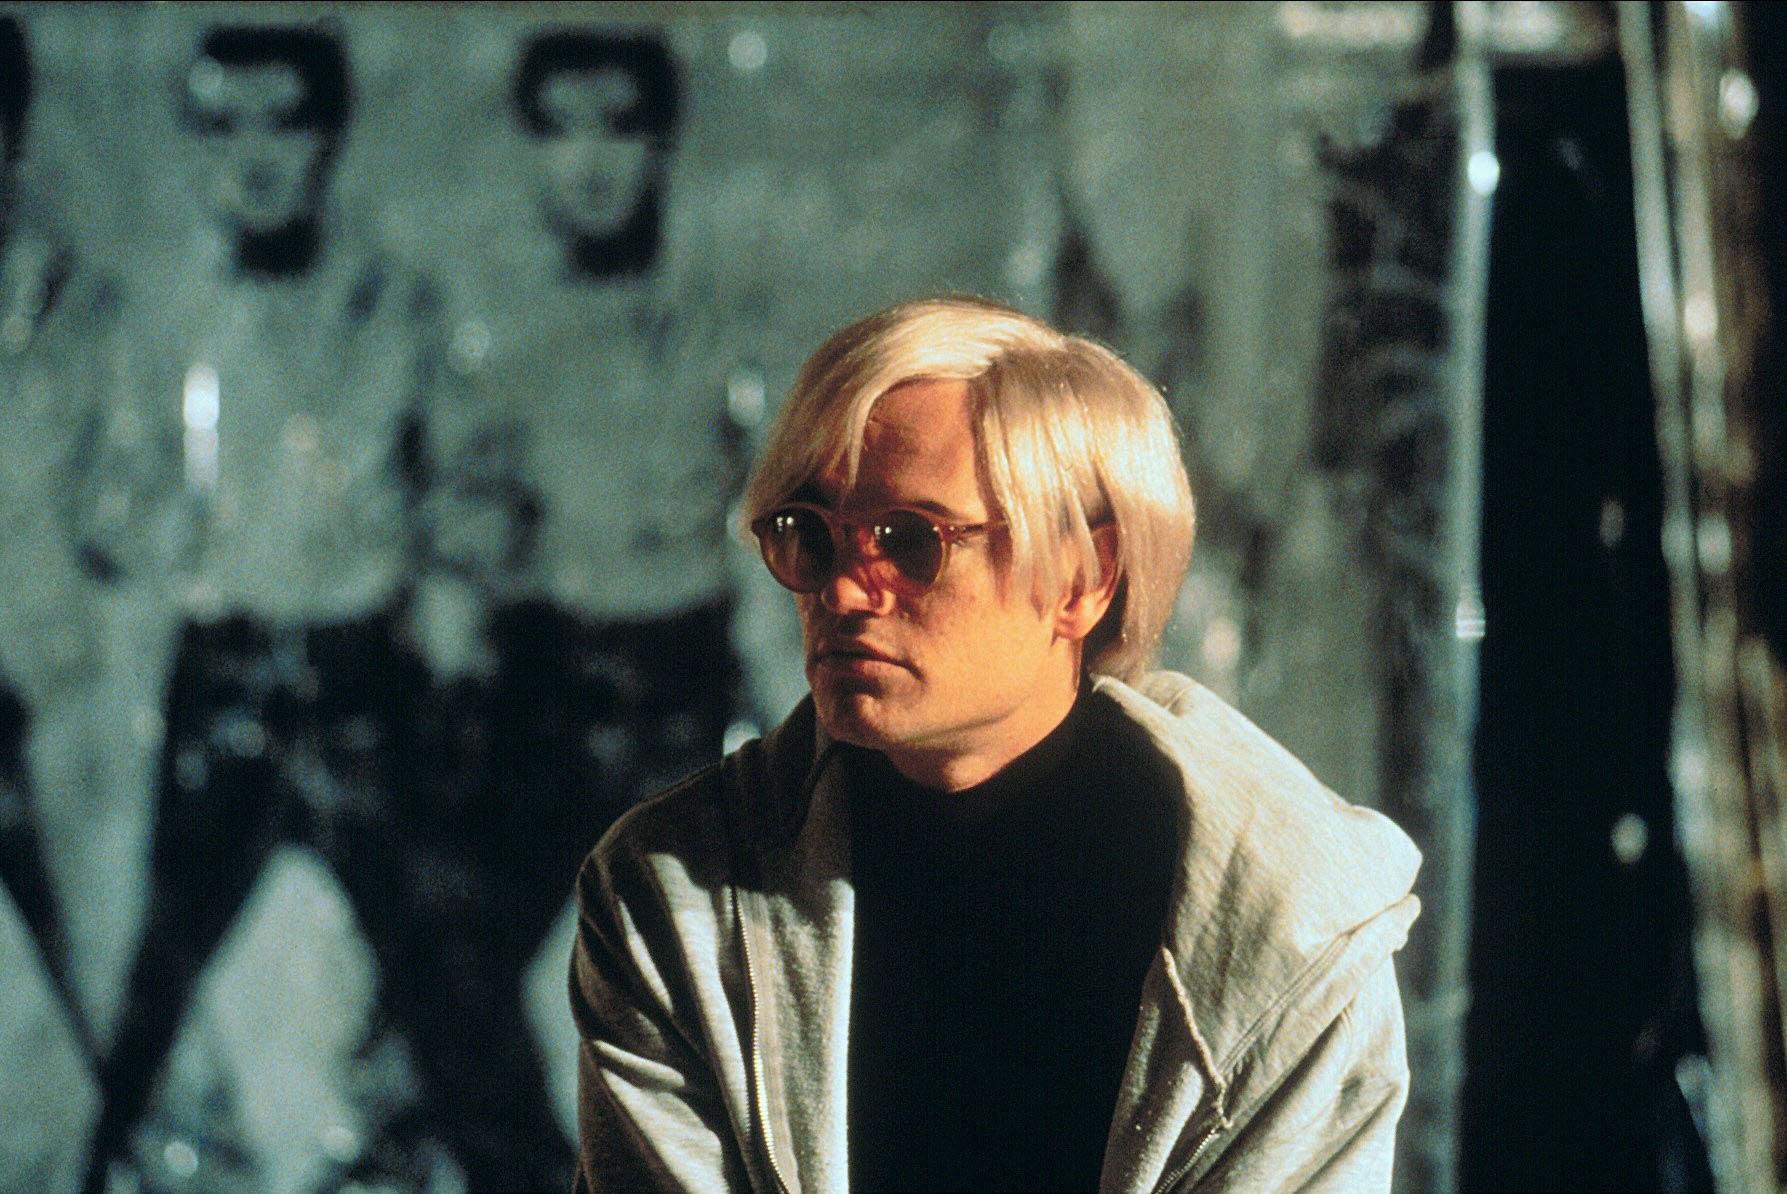 Джаред Харрис вроли Энди Уорхола вфильме «Я стреляла вЭнди Уорхола», 1996